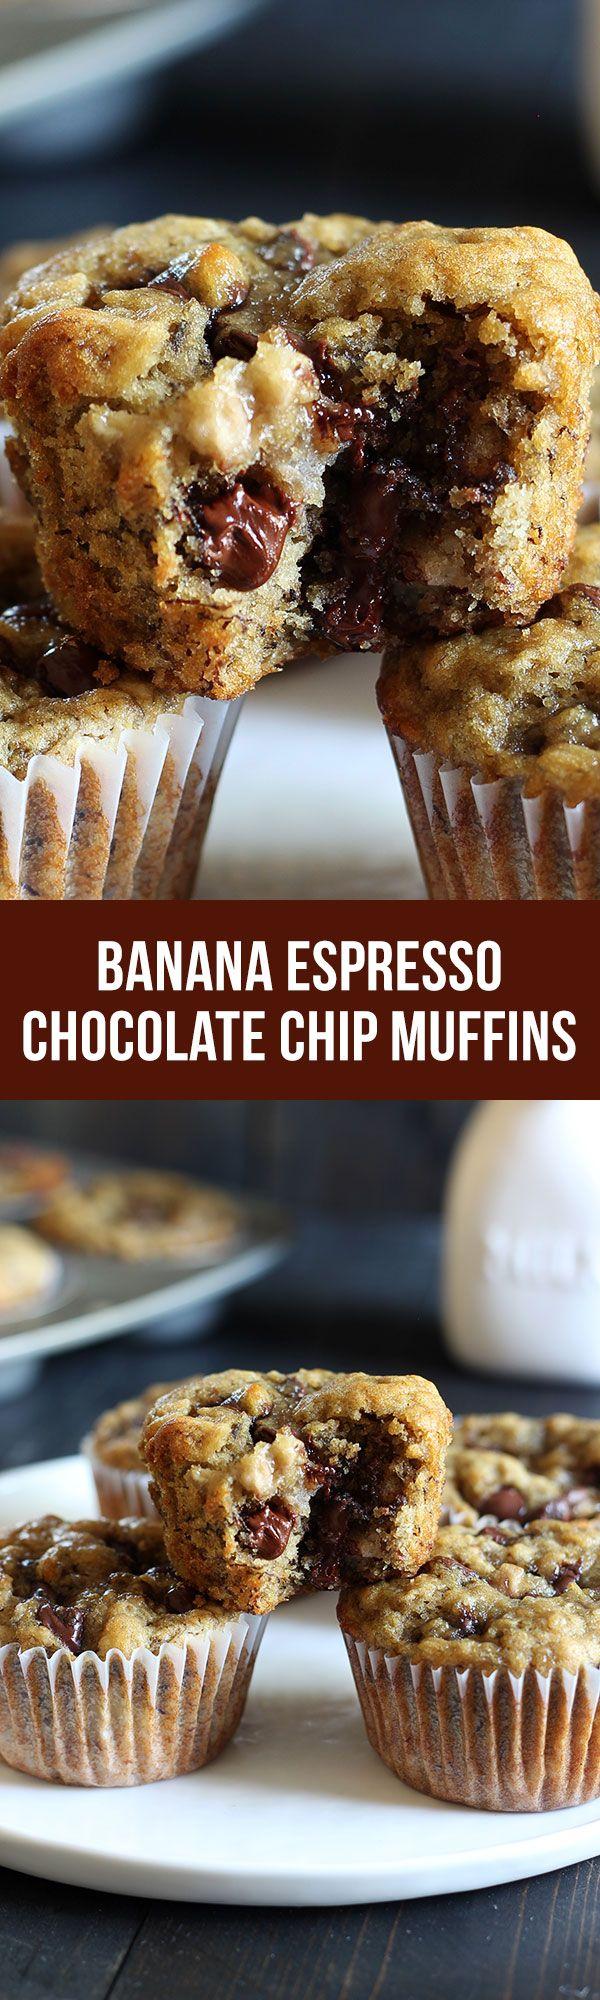 Banana Pudding clipart banana muffin Chocolate Banana Espresso Muffins Plantains